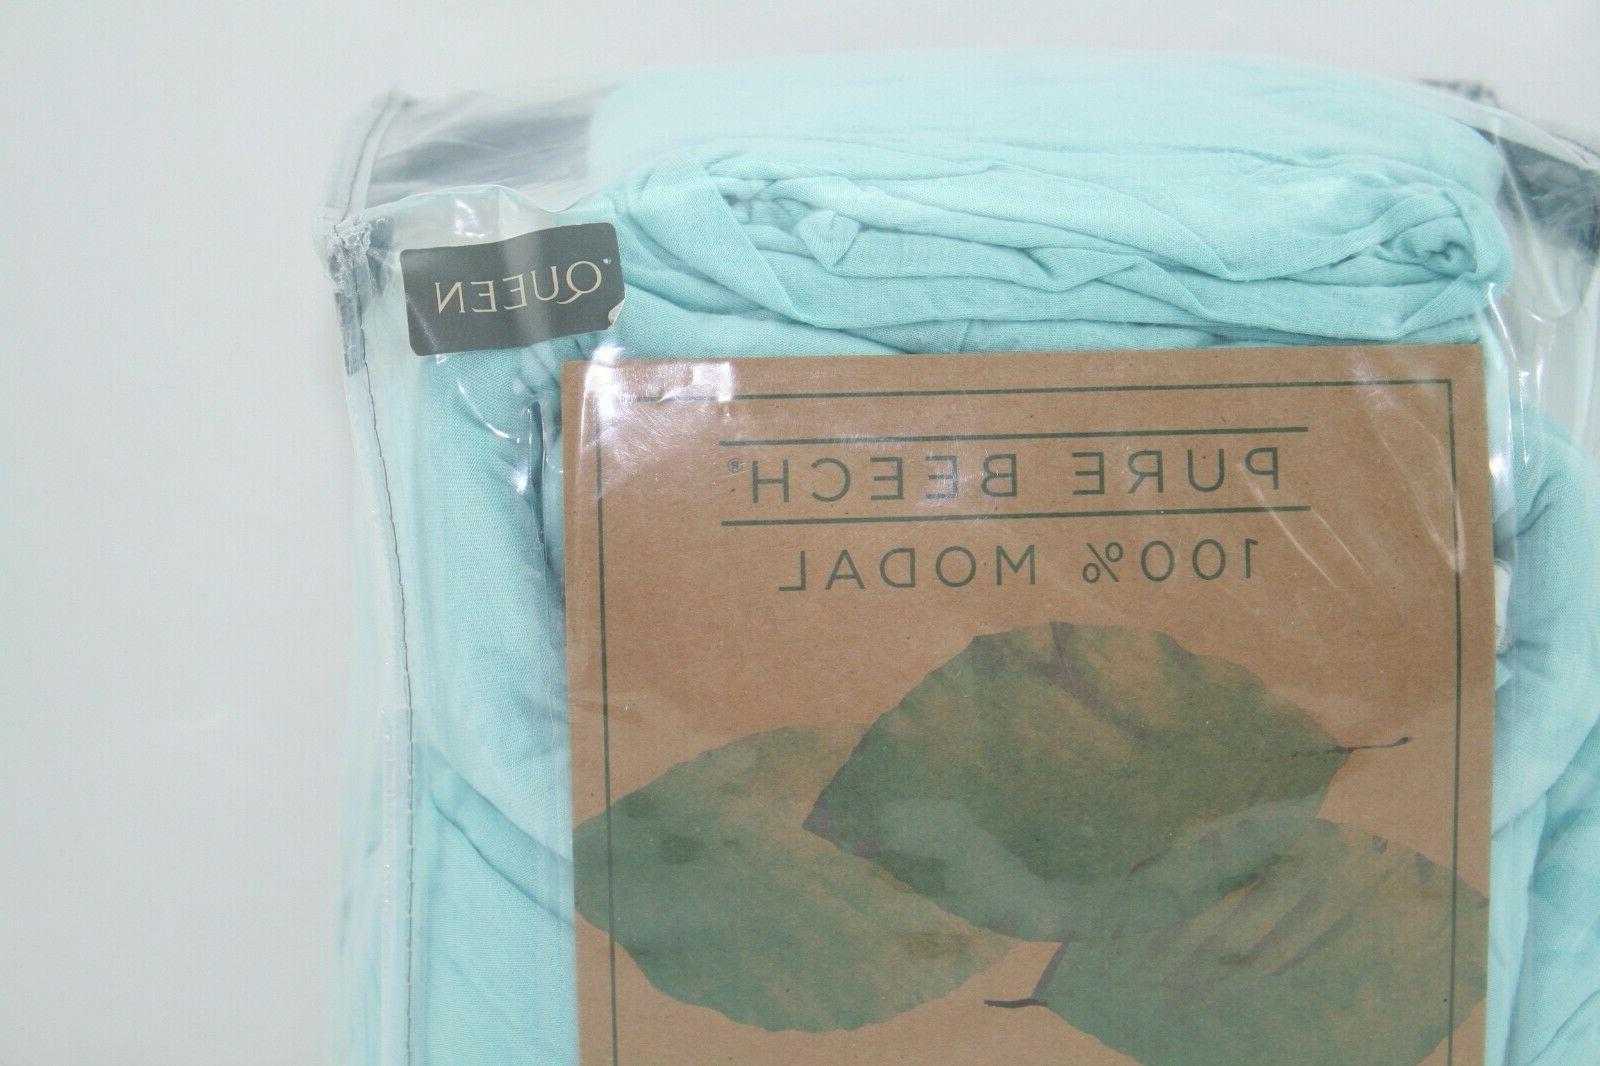 Modal Beech Jersey Set In - New